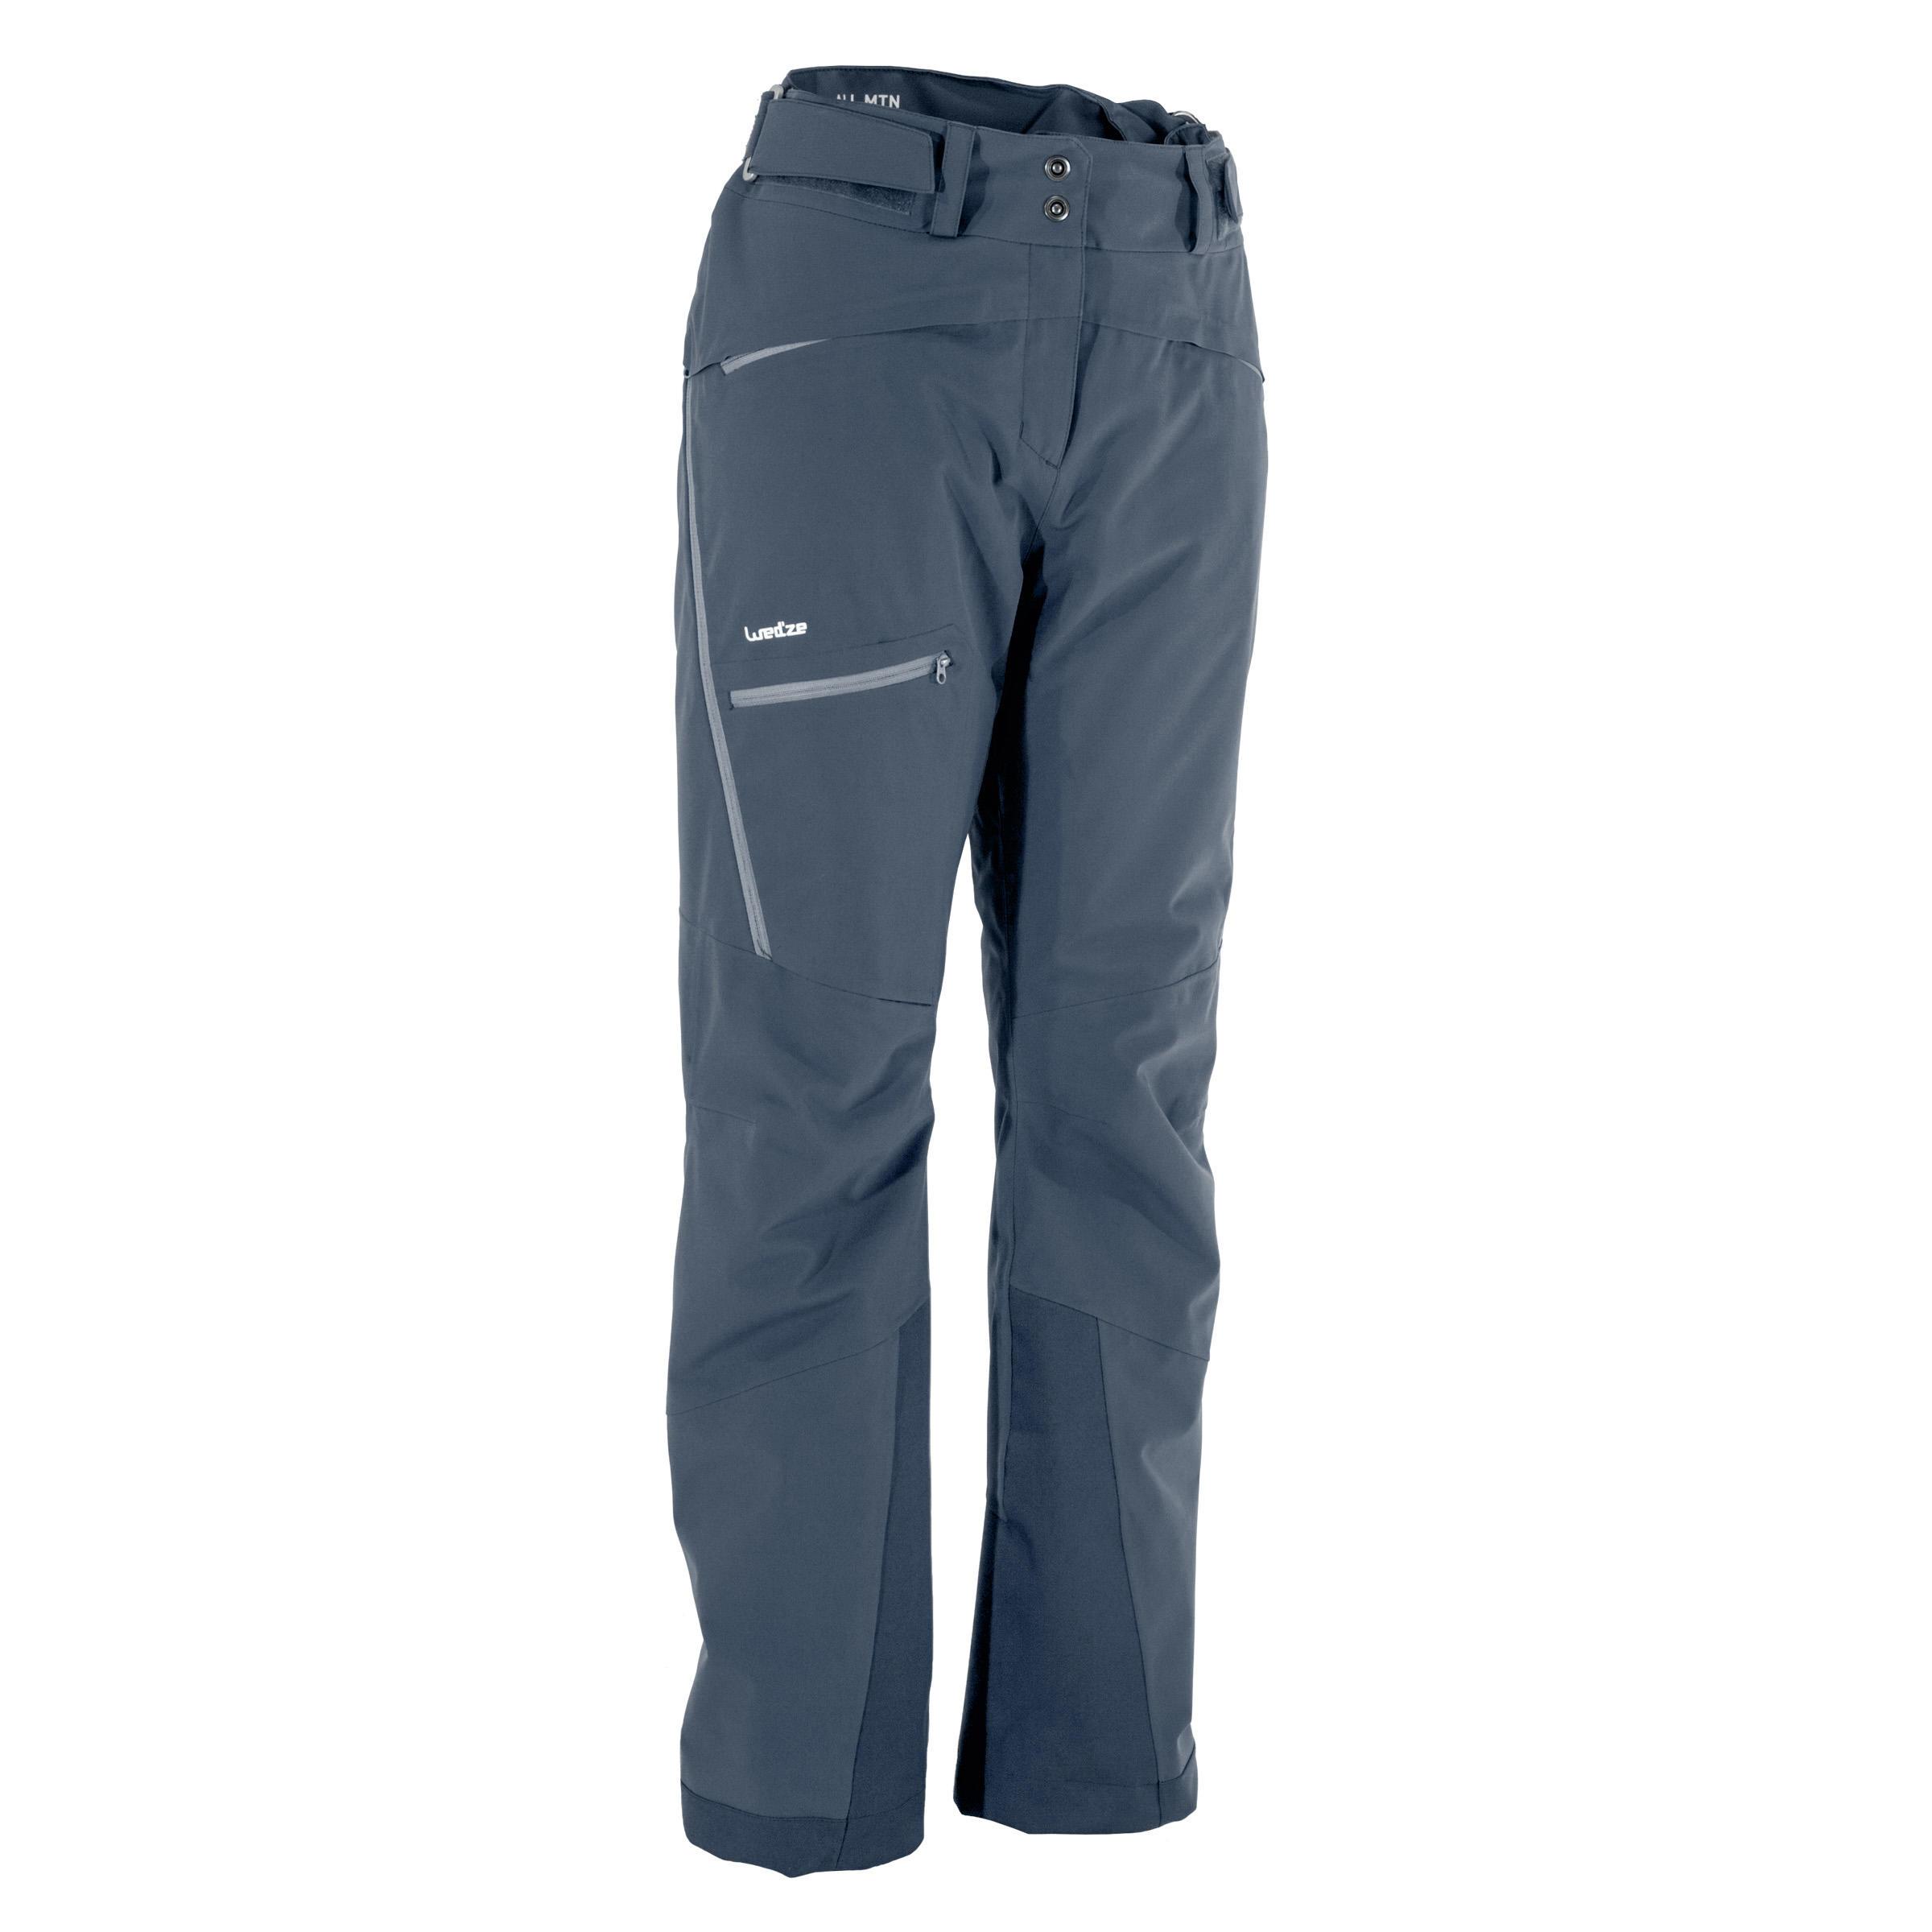 Skihose Allmountain 900 Damen blau | Sportbekleidung > Sporthosen > Skihosen | Blau | Wed'ze